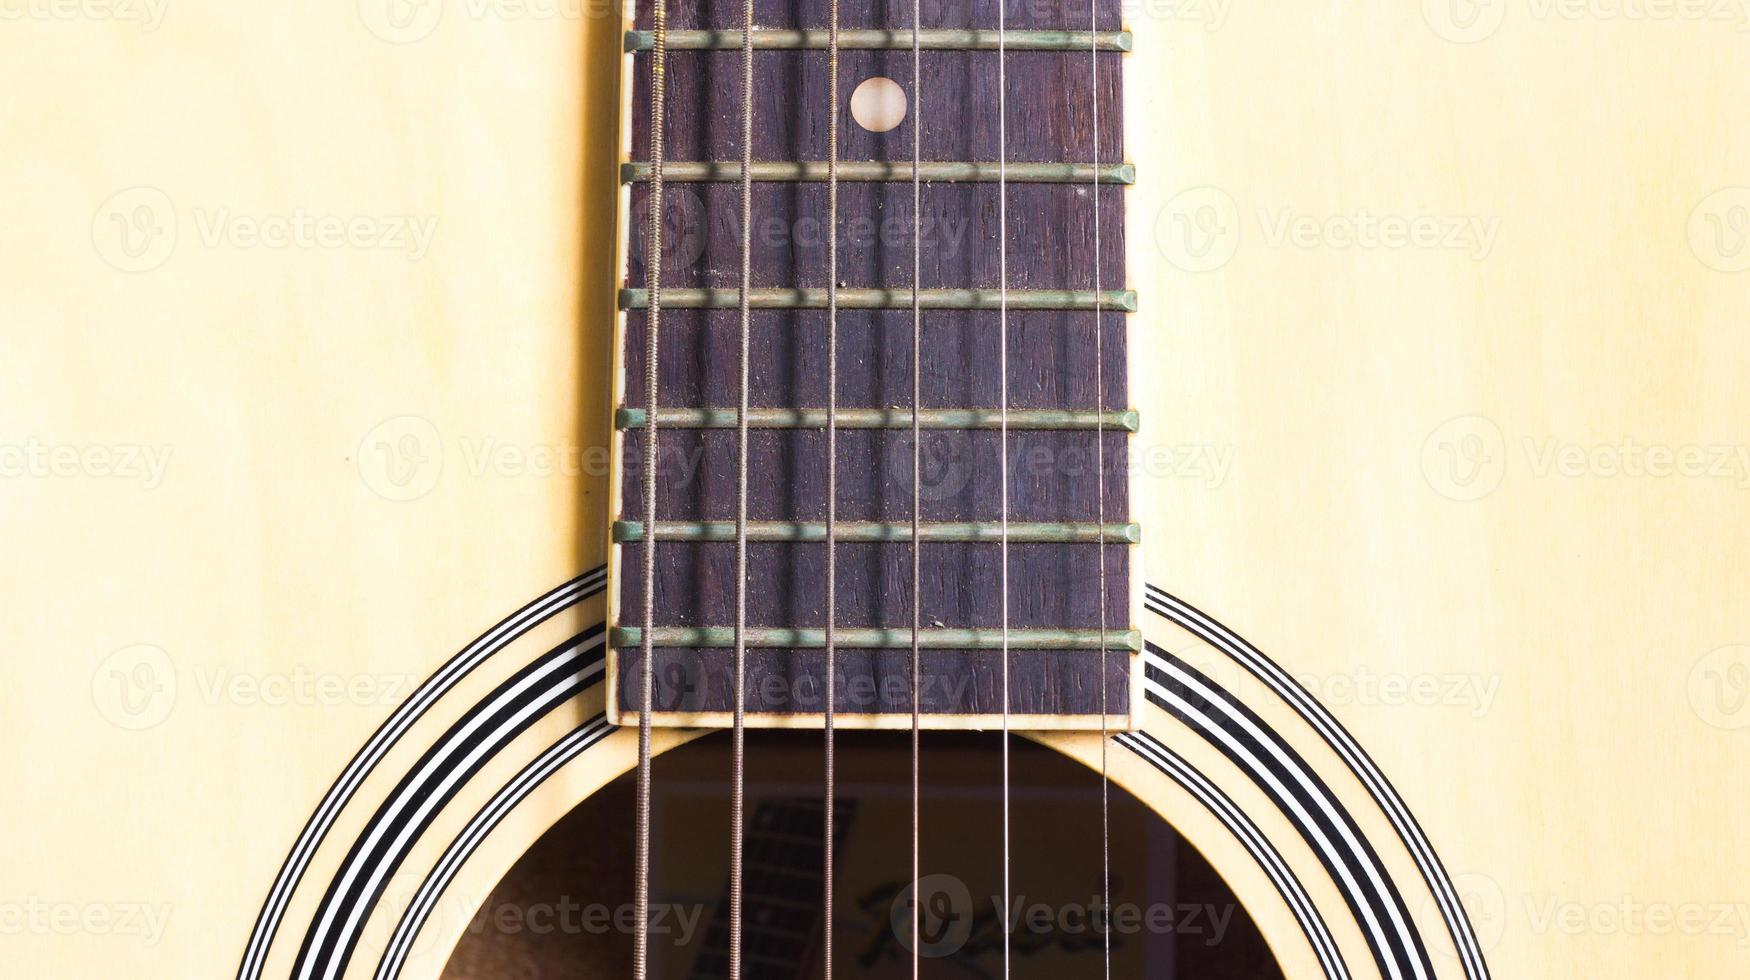 Nahaufnahme Saite der Gitarre foto